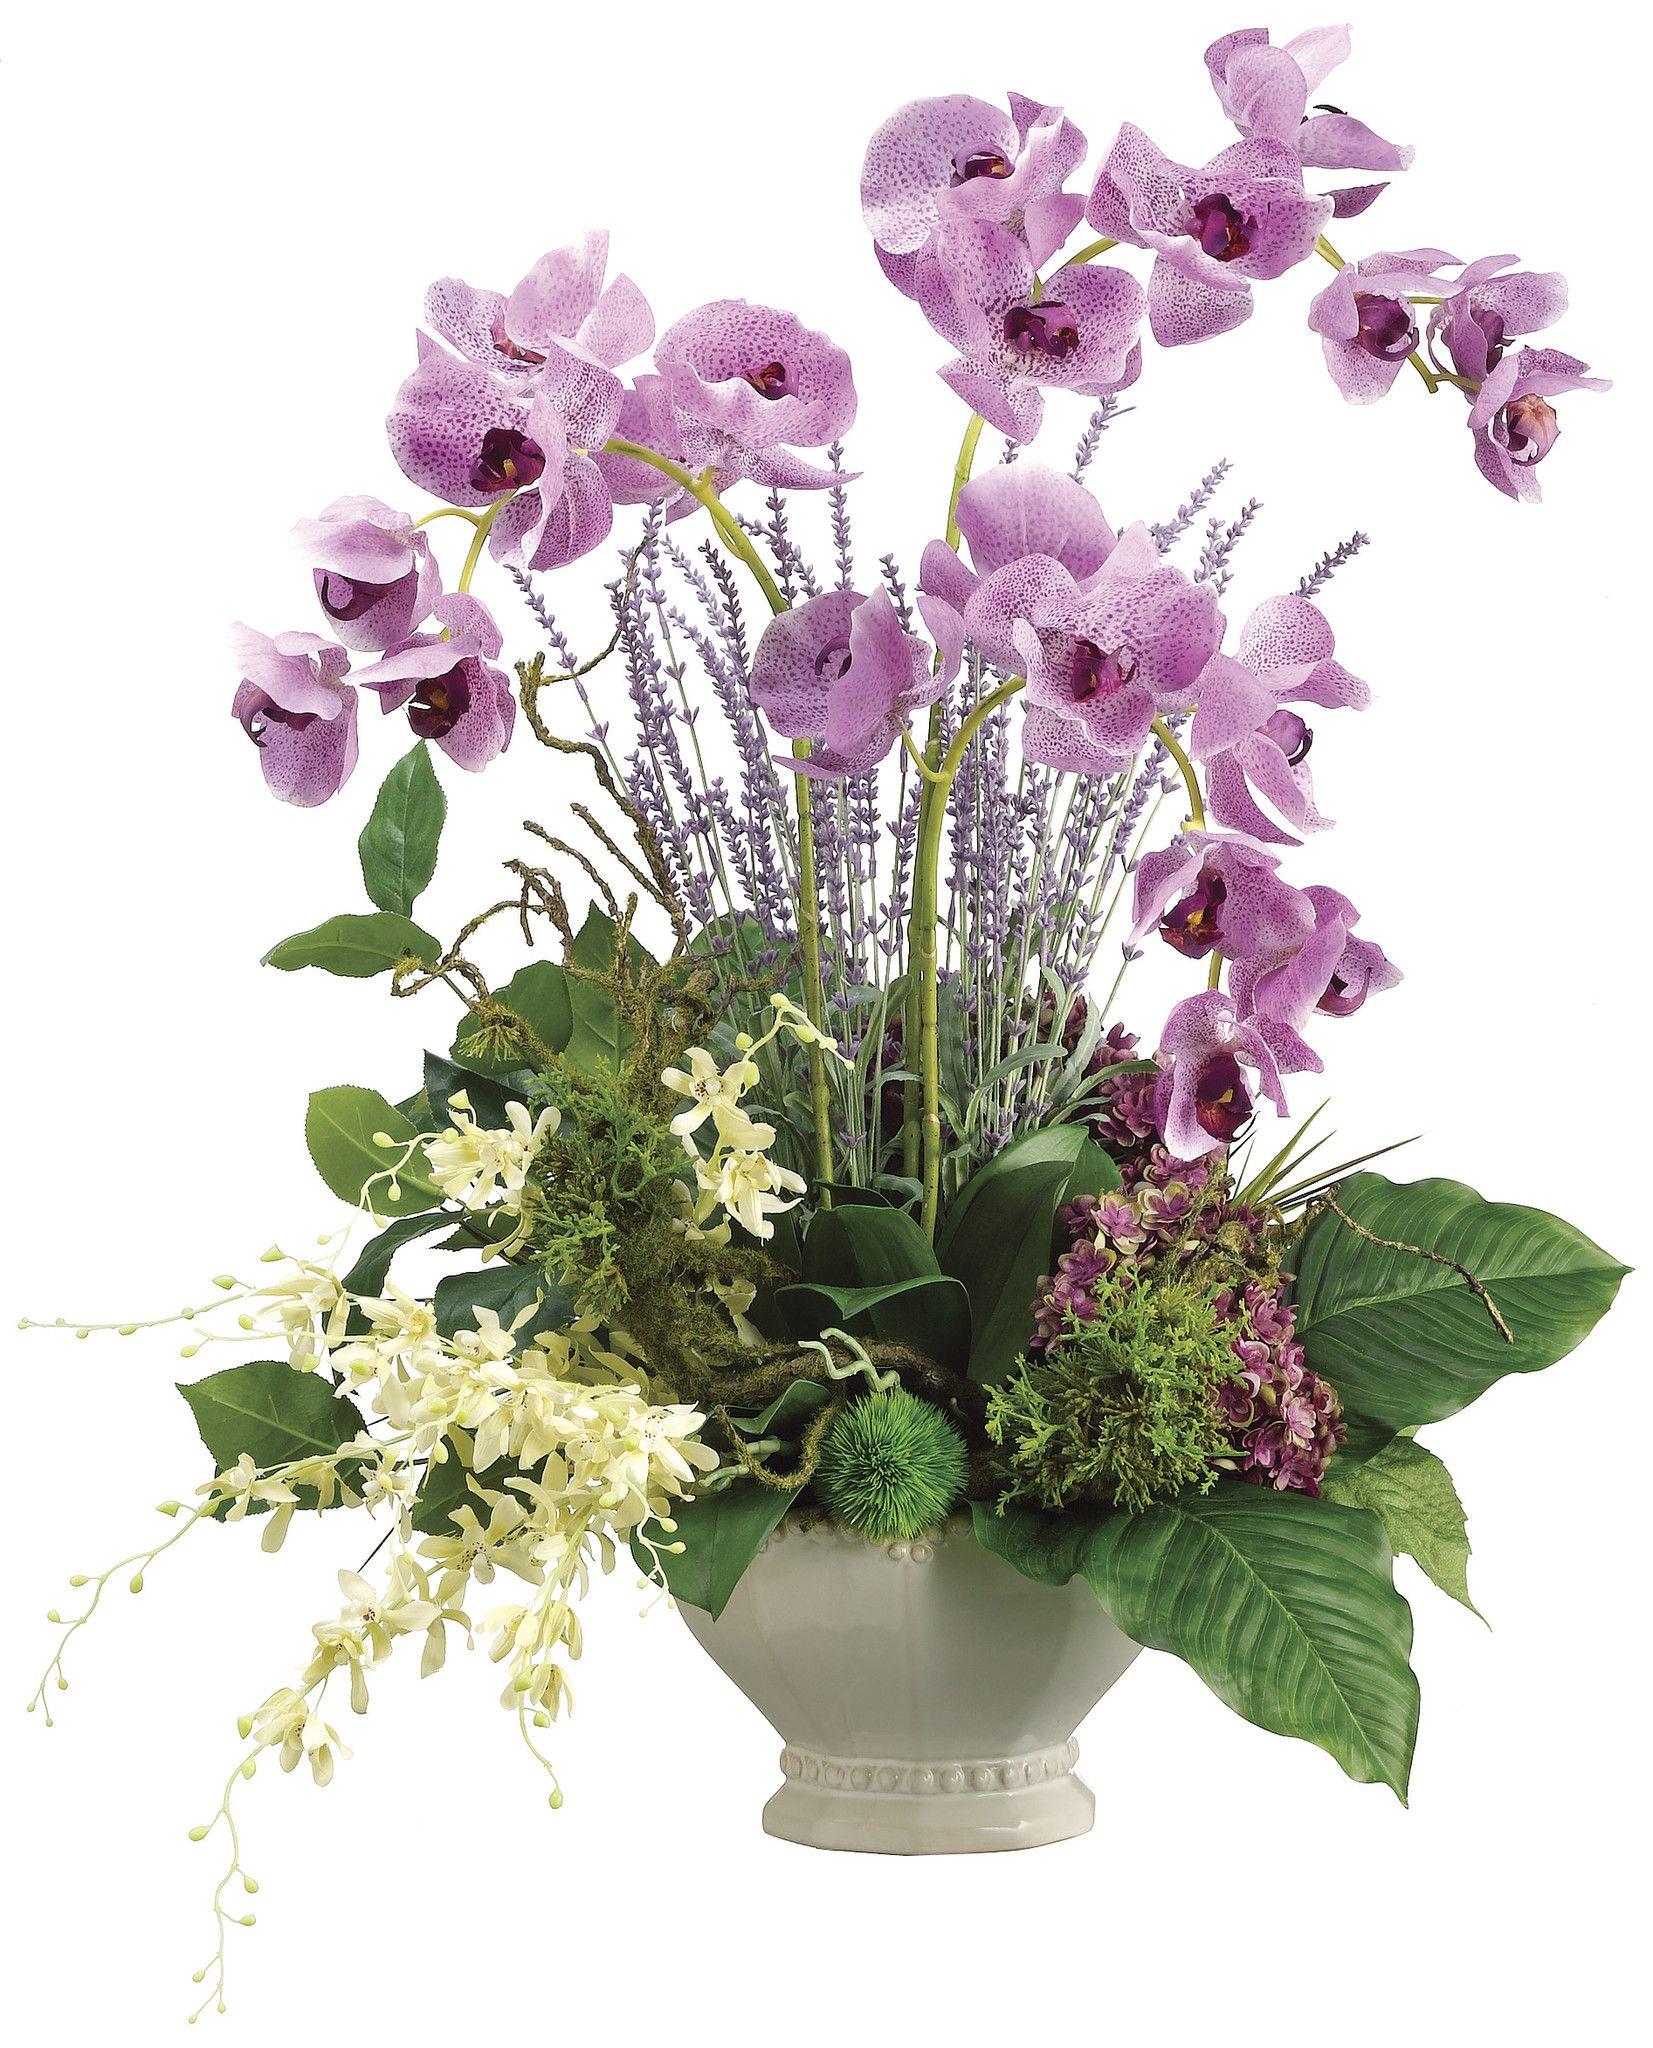 Phalaenopsis orchid dendrobium orchid and hydrangea arrangement blumen christa orchideen - Orchideen arrangement ...